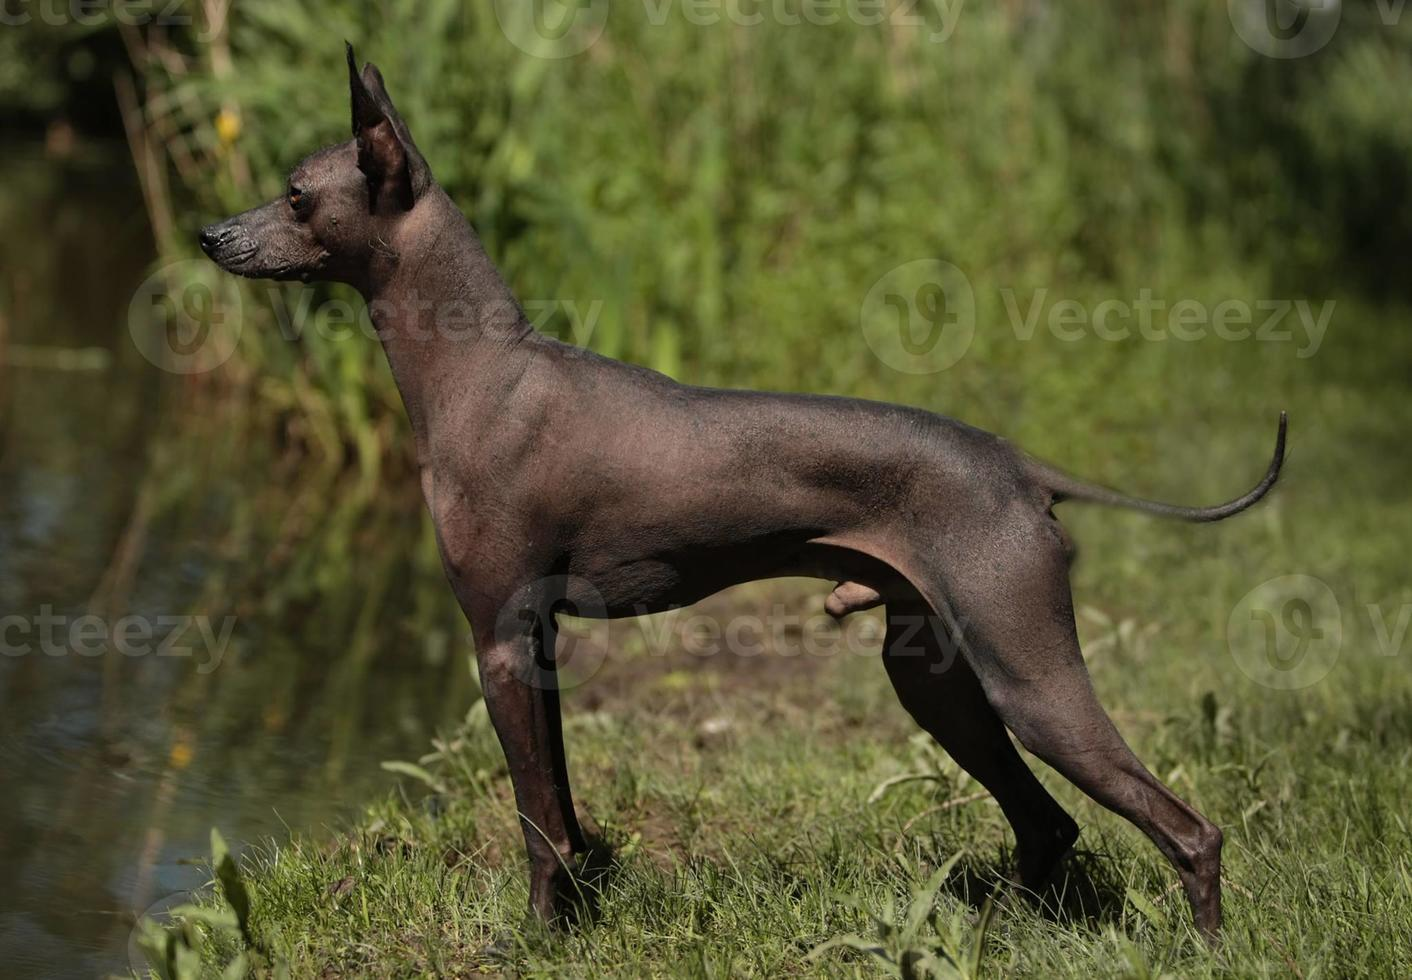 cane senza peli peruviano, chien nobile sagan, peruaanse naakthond, naakthond foto